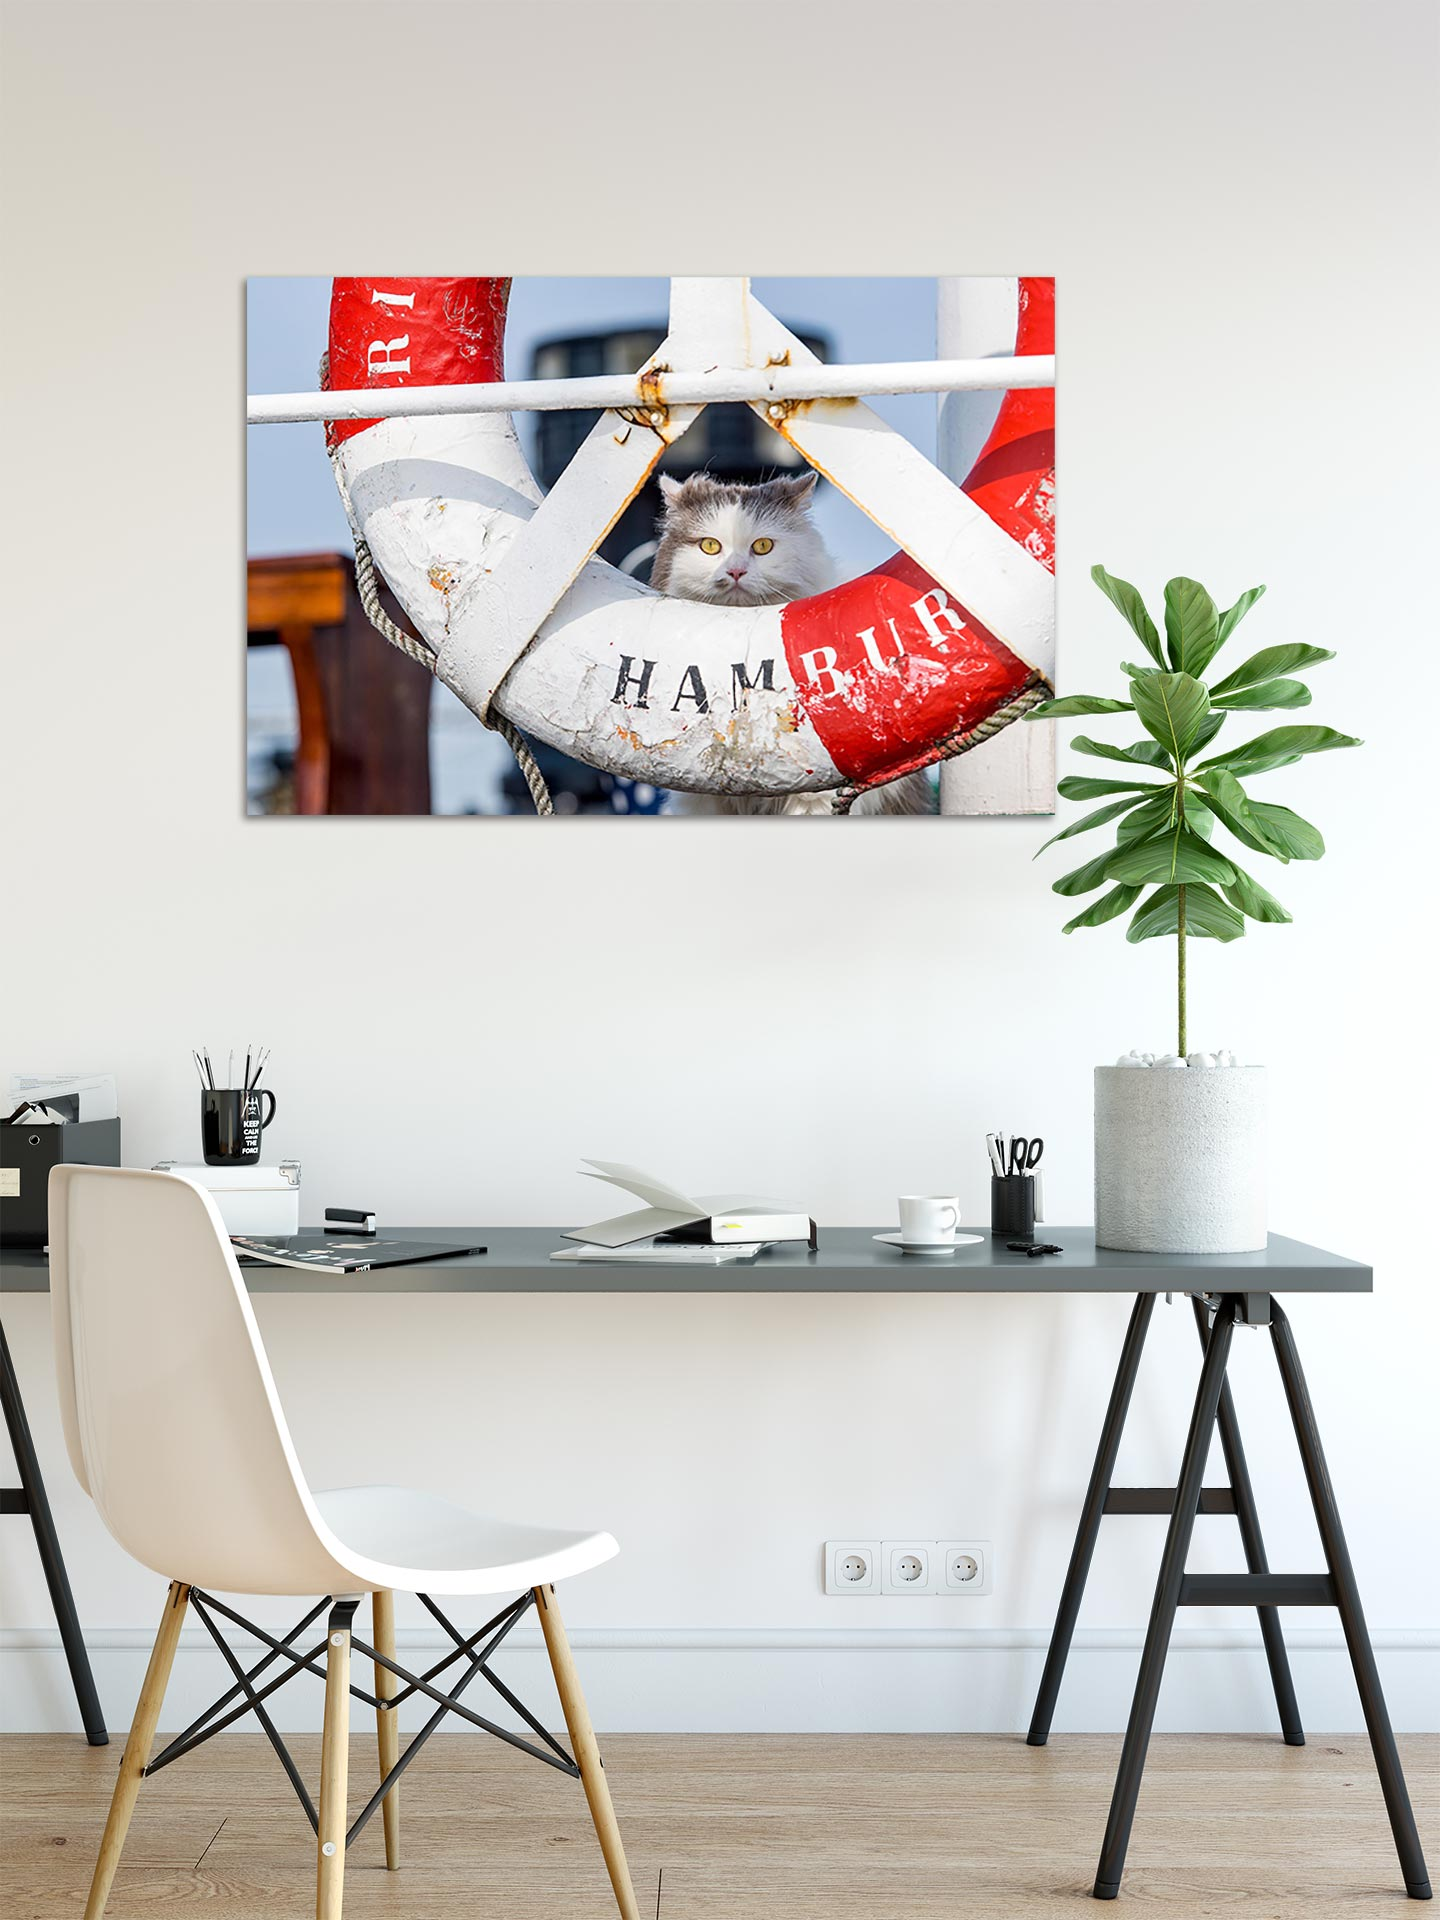 NL076-simon-hamburg-wandbild-bild-auf-leinwand-acrylglas-aludibond-arbeitszimmer